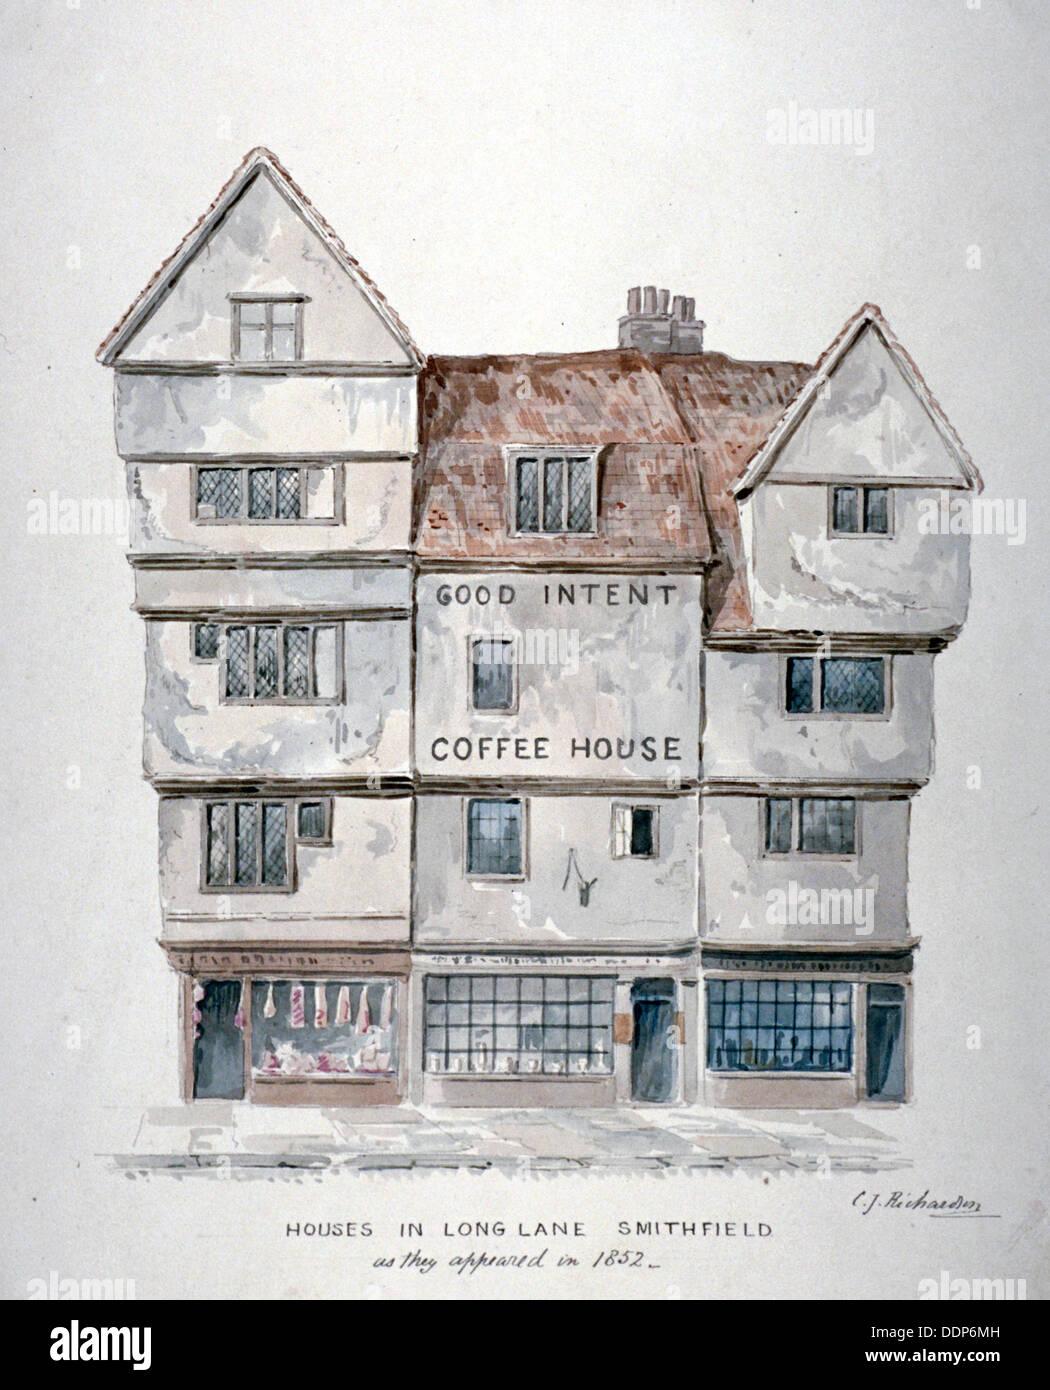 Buildings in Long Lane, Smithfield, City of London, 1852. Artist: Charles James Richardson - Stock Image